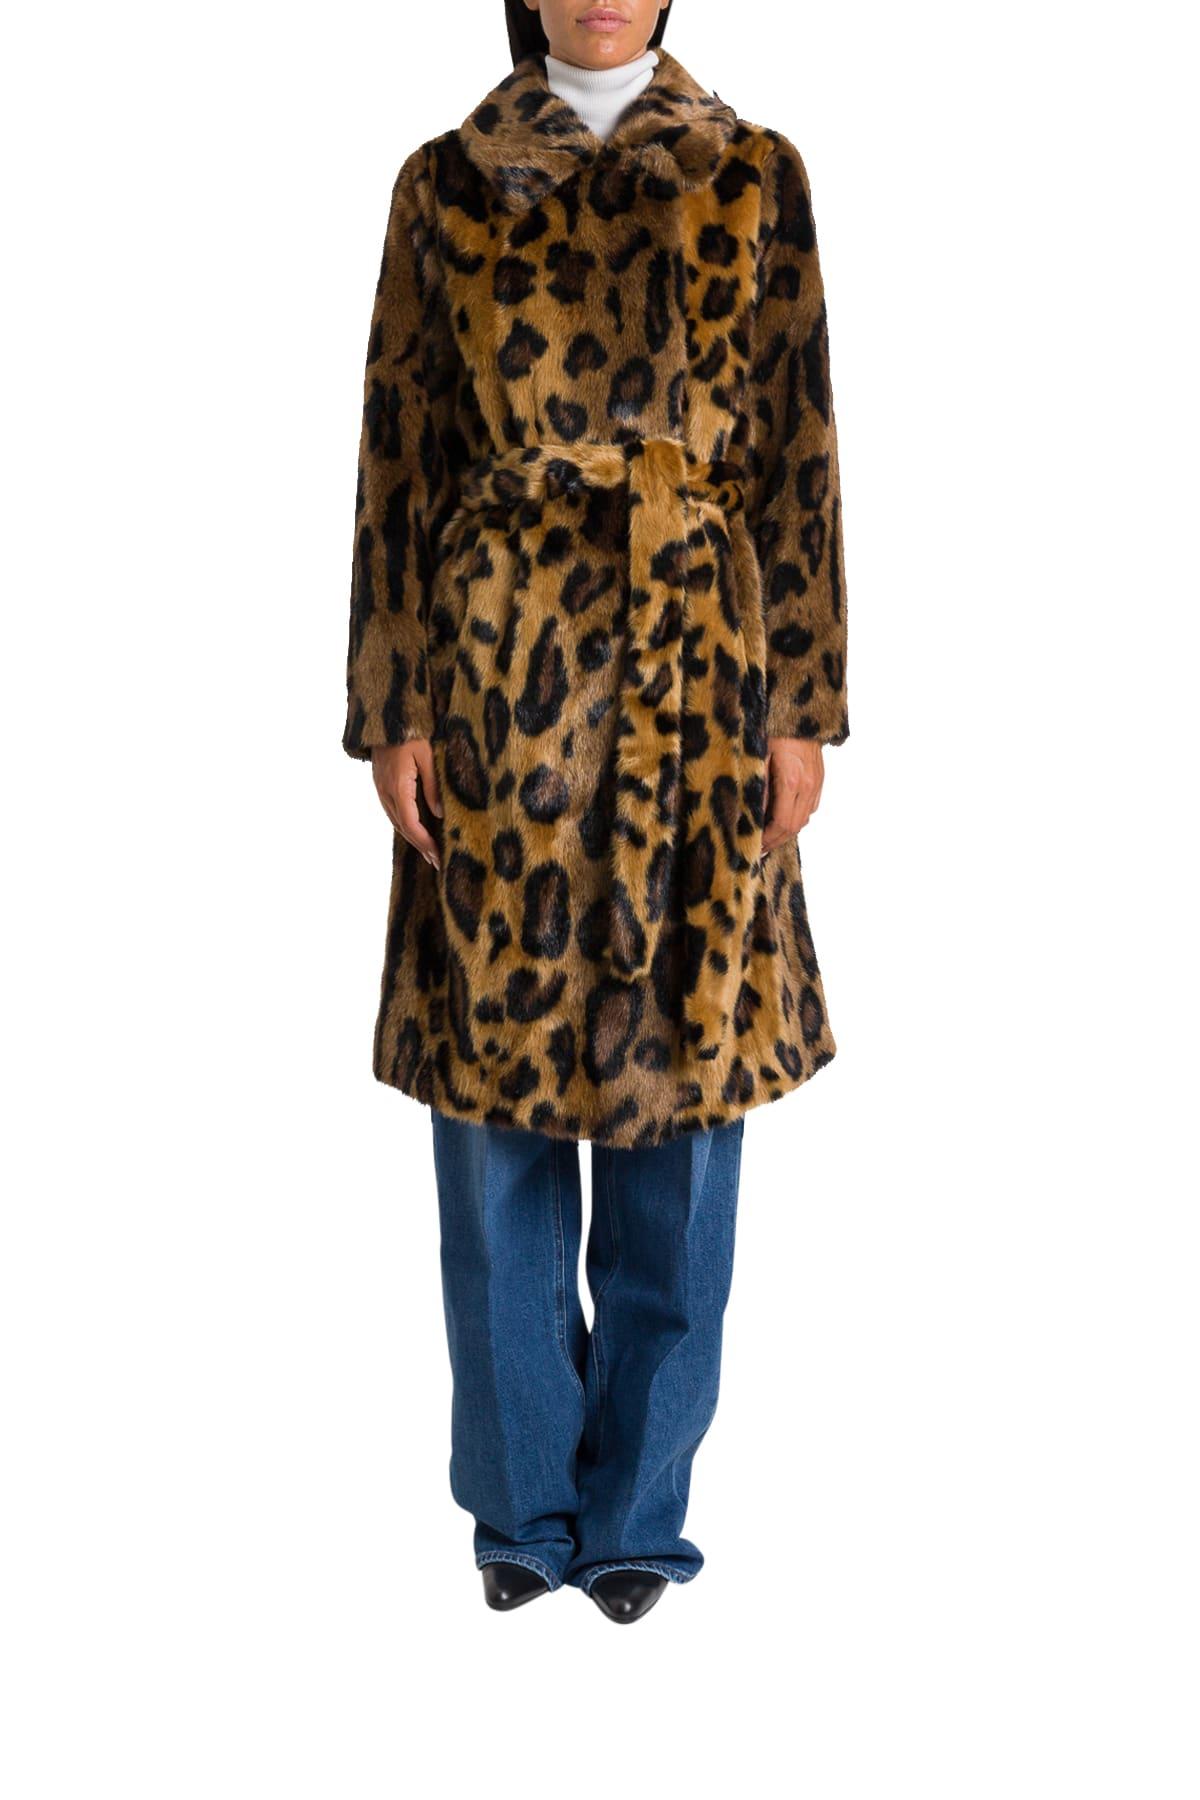 Photo of  STAND STUDIO Irina Faux Fur- shop STAND STUDIO jackets online sales